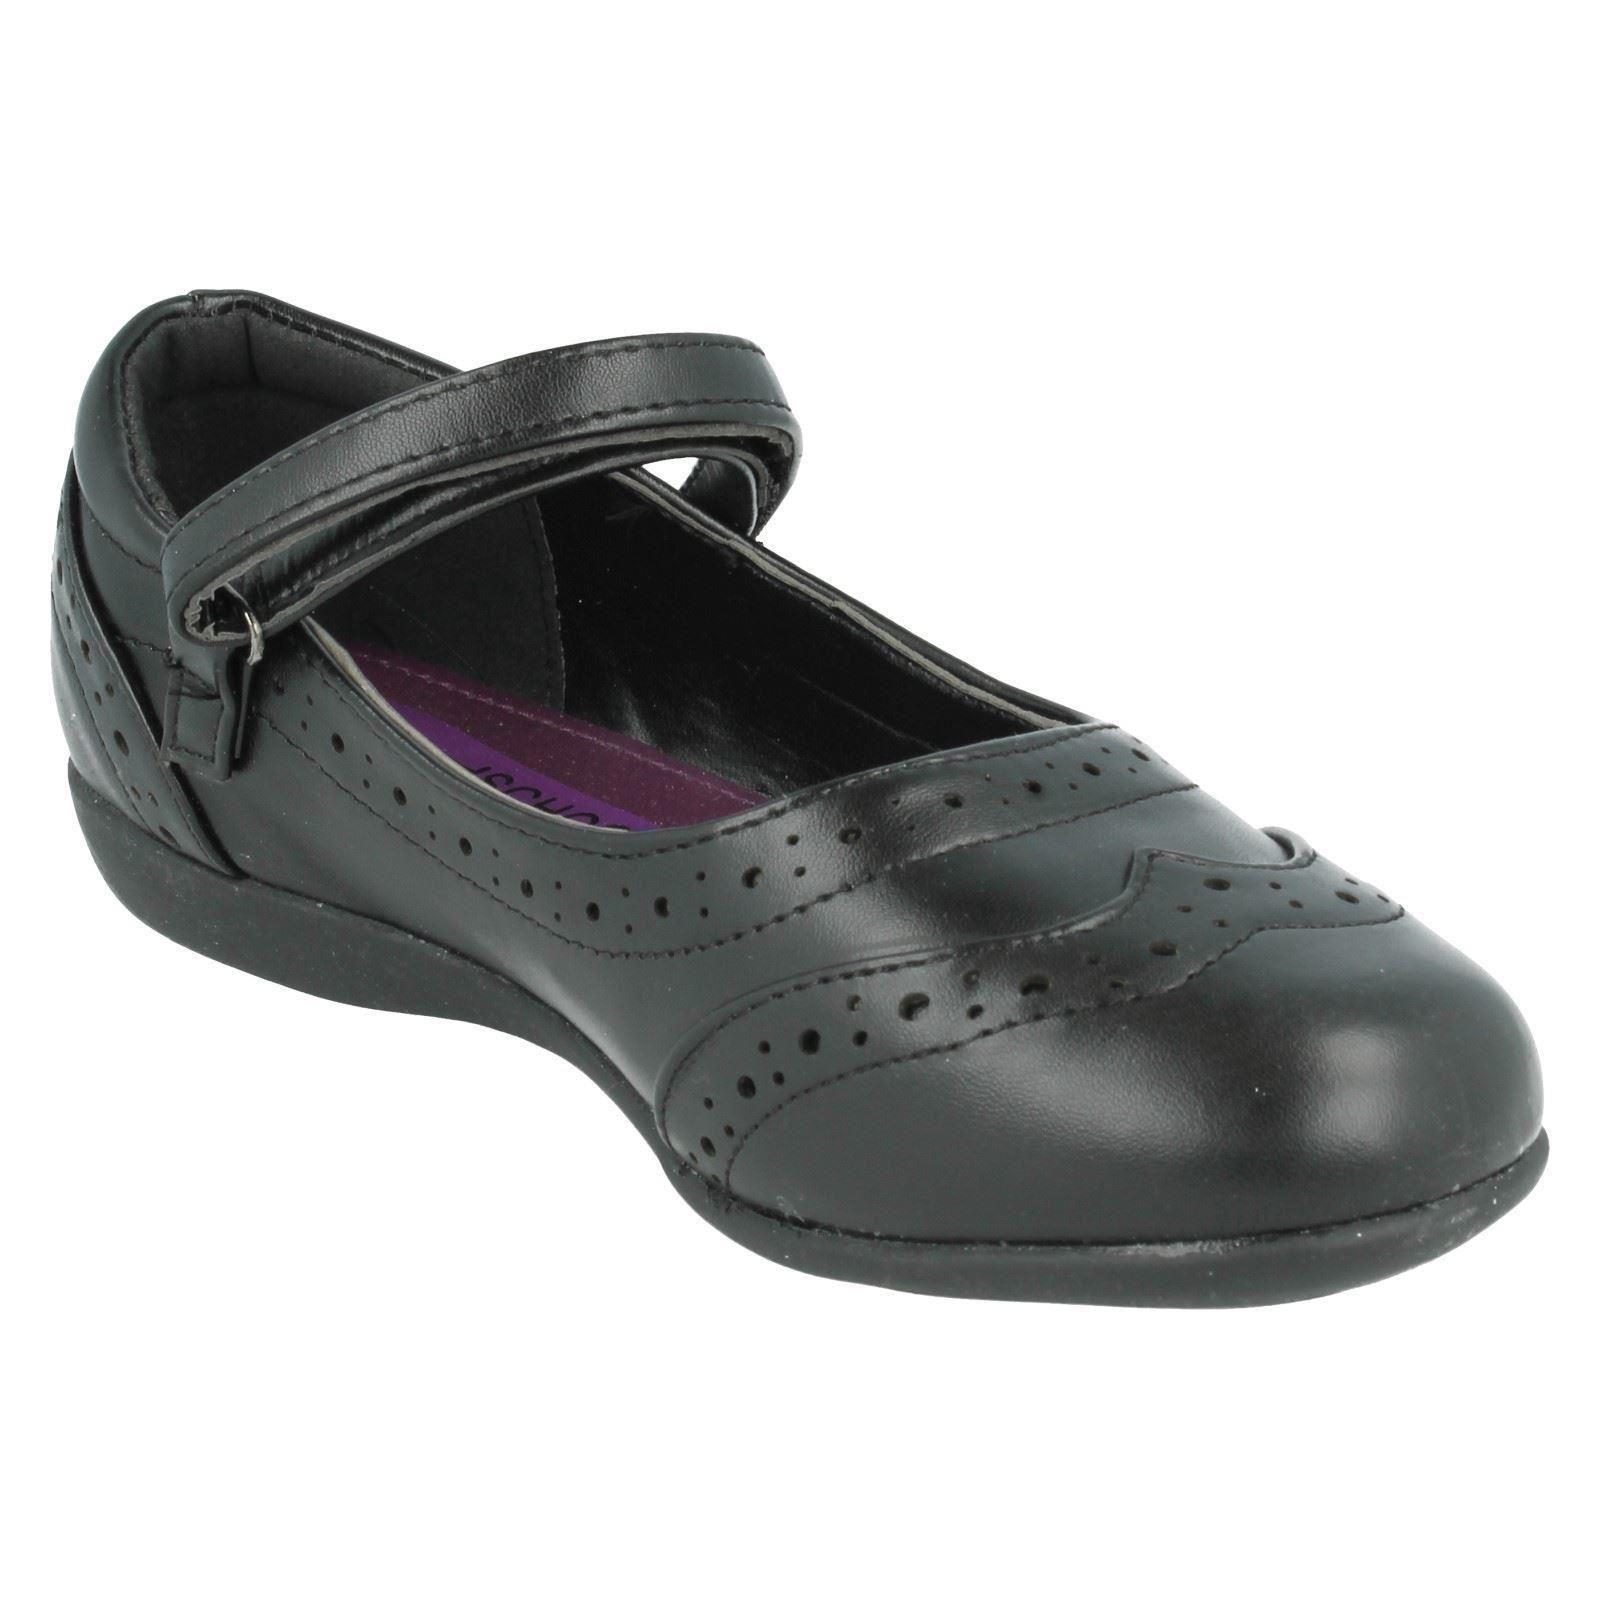 Girls Cool 4 School Shoes H2342